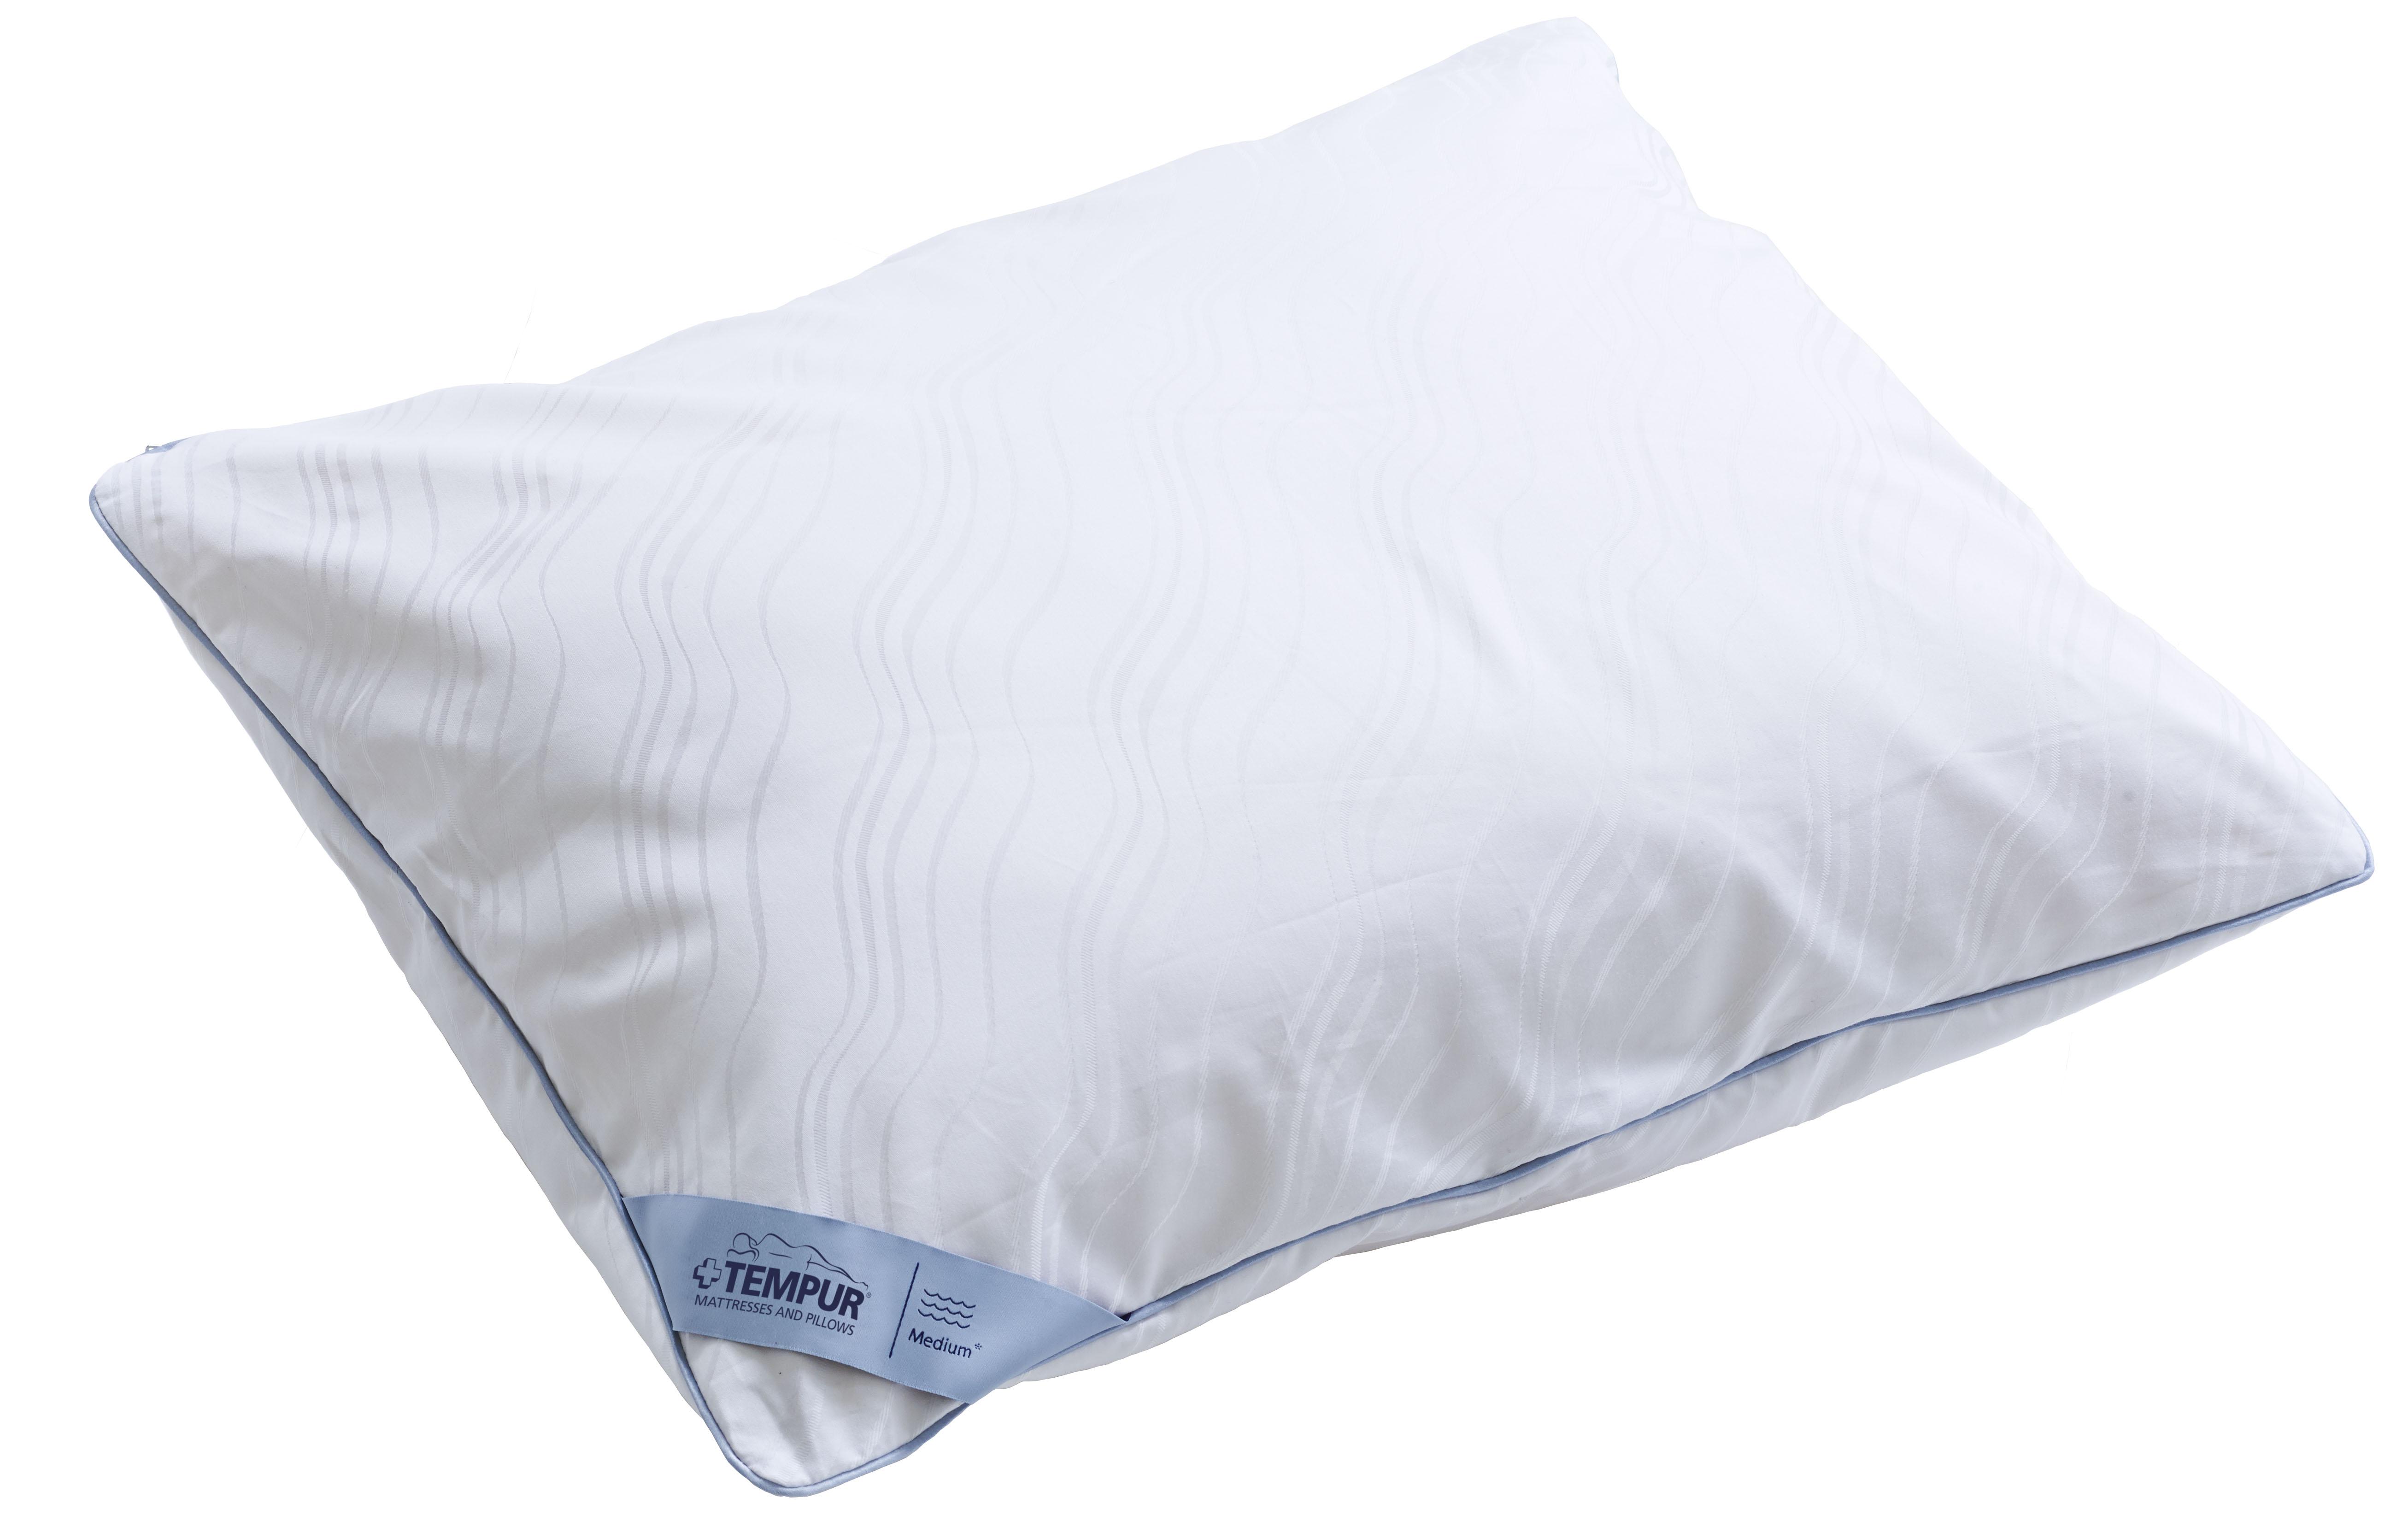 TEMPUR EasyClean Pillow